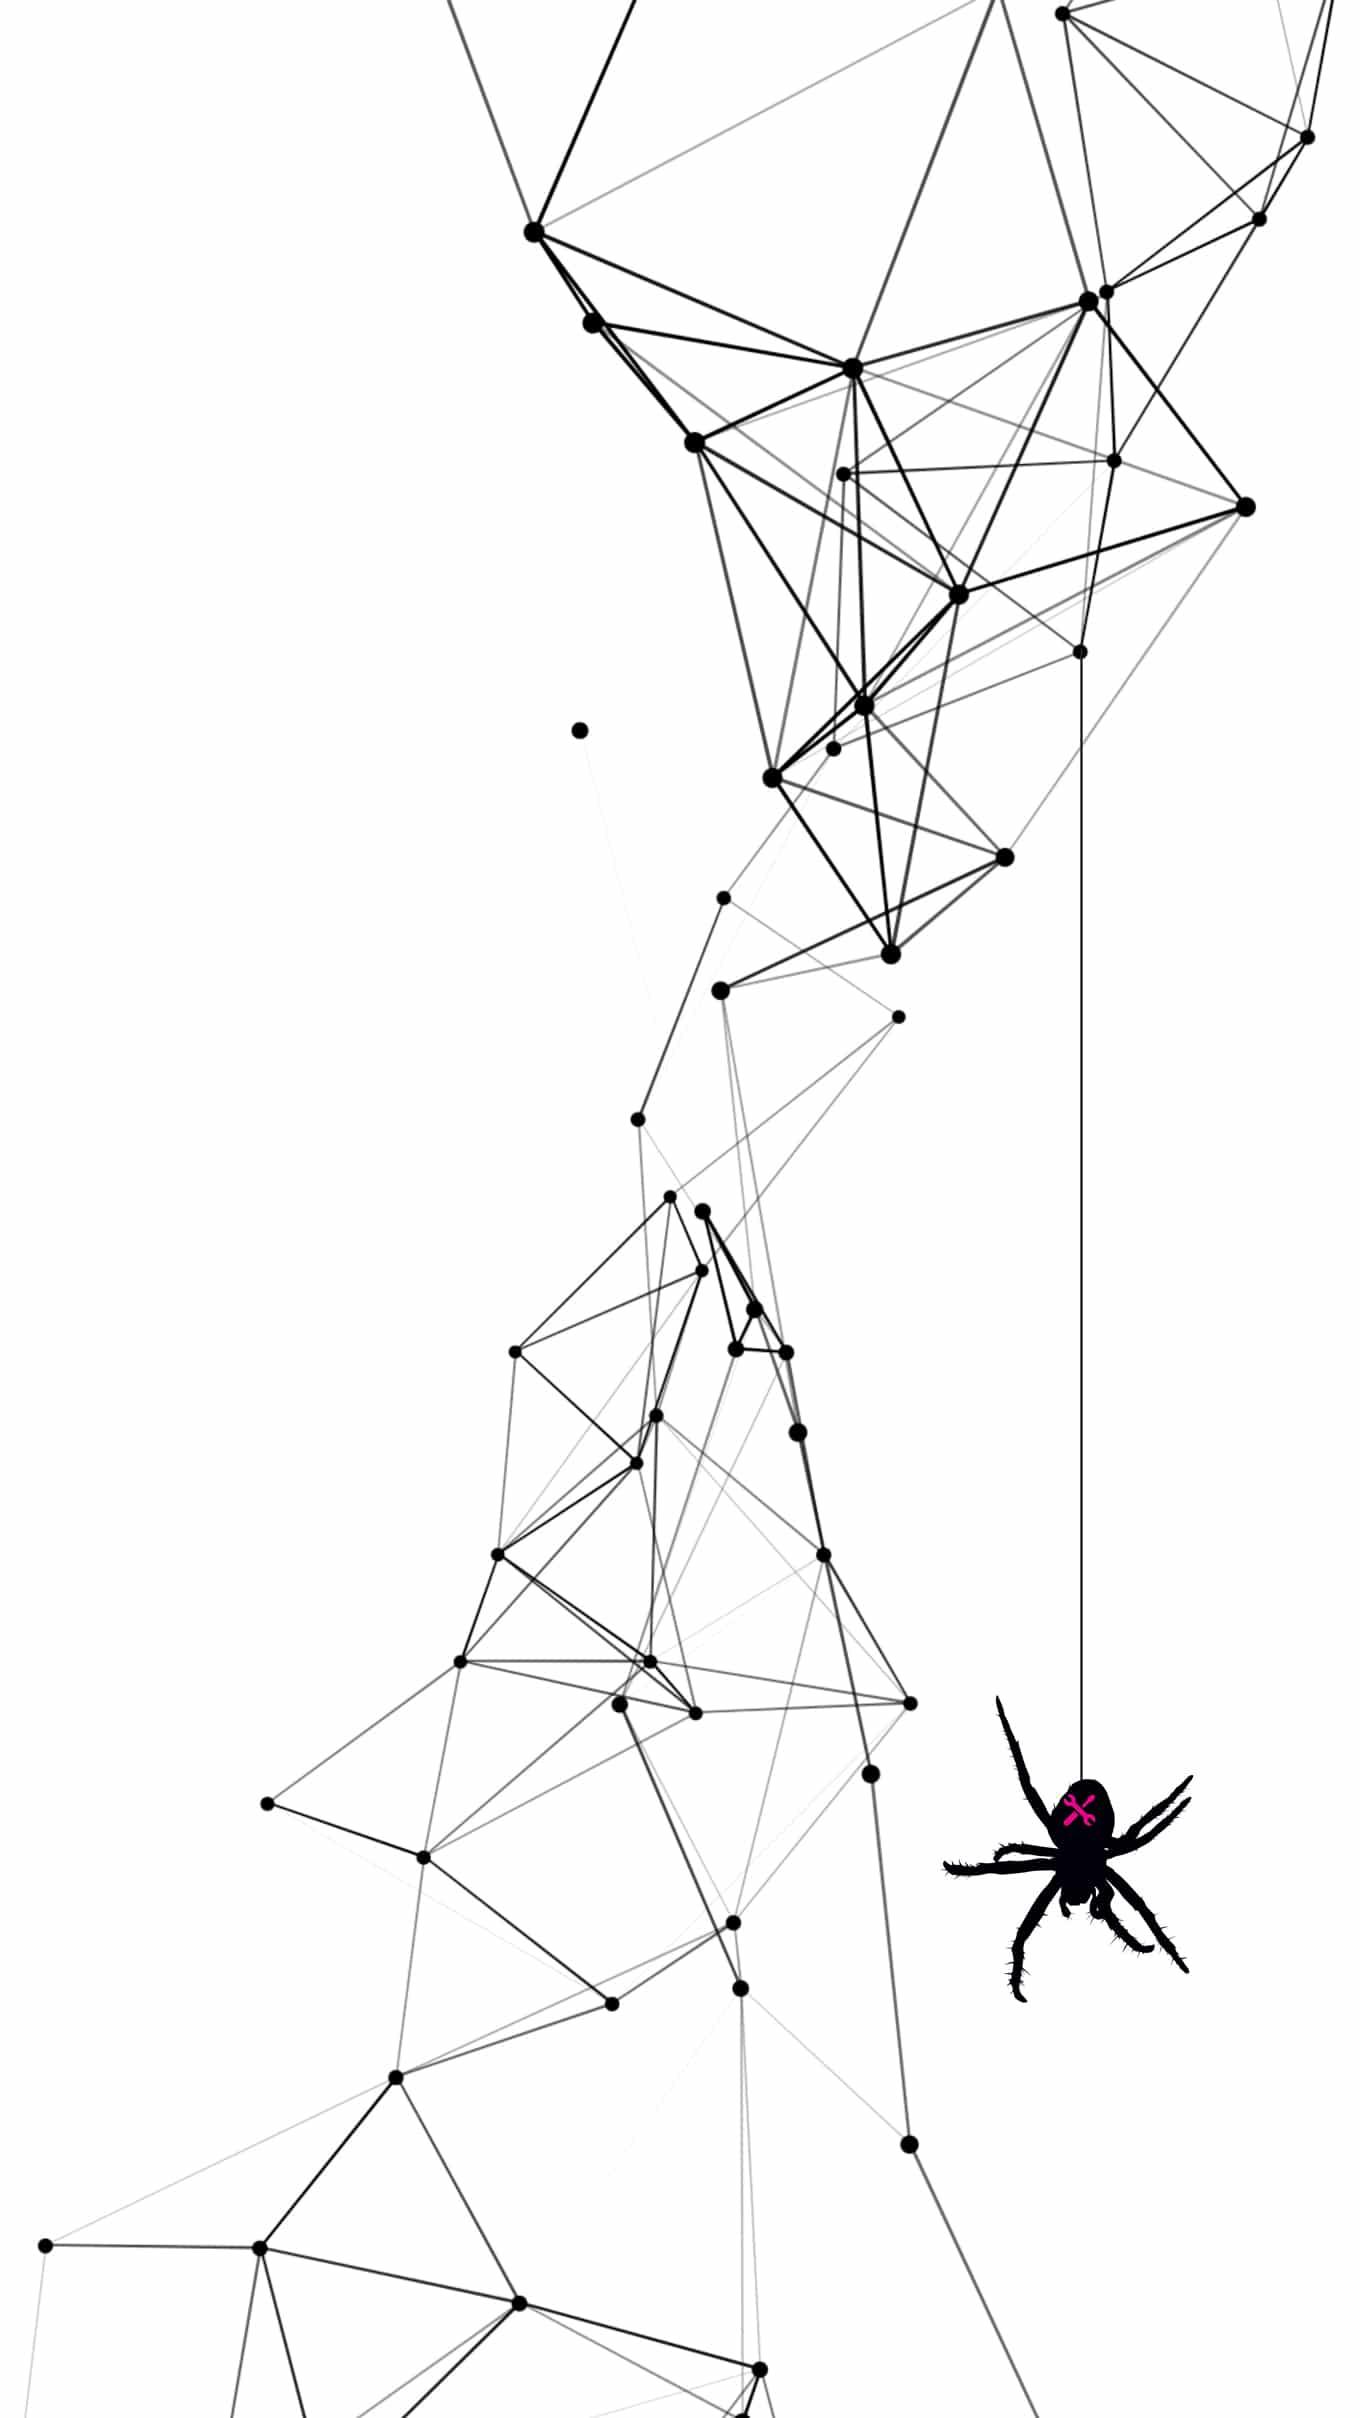 Mega spider web illustration